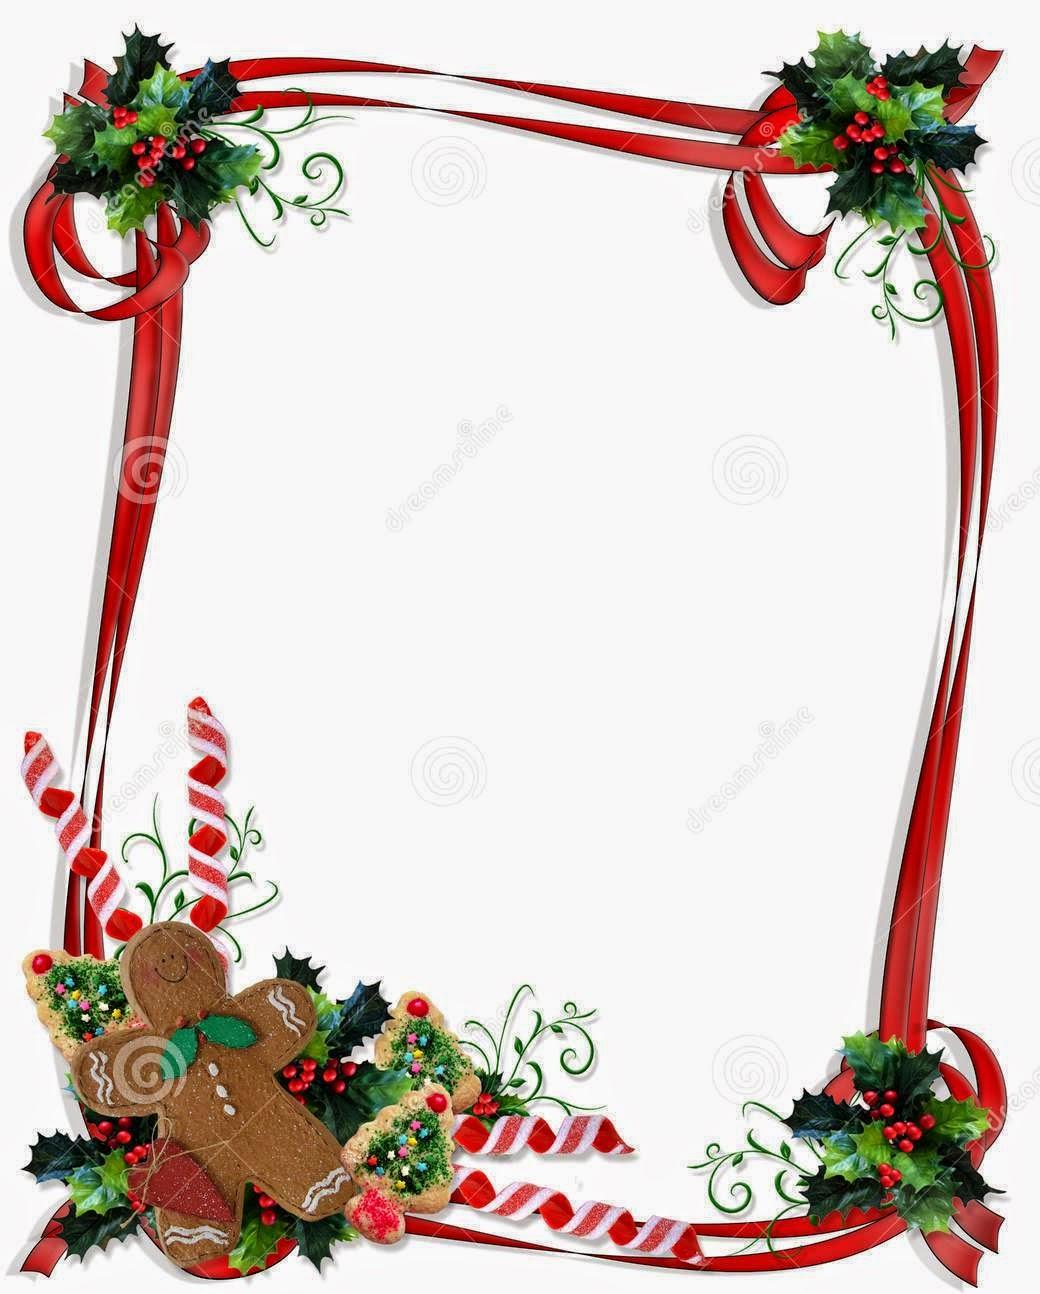 Christmas clip art printables jpg library download Free Printable Christmas Clip Art & Printable Christmas Clip Art ... jpg library download